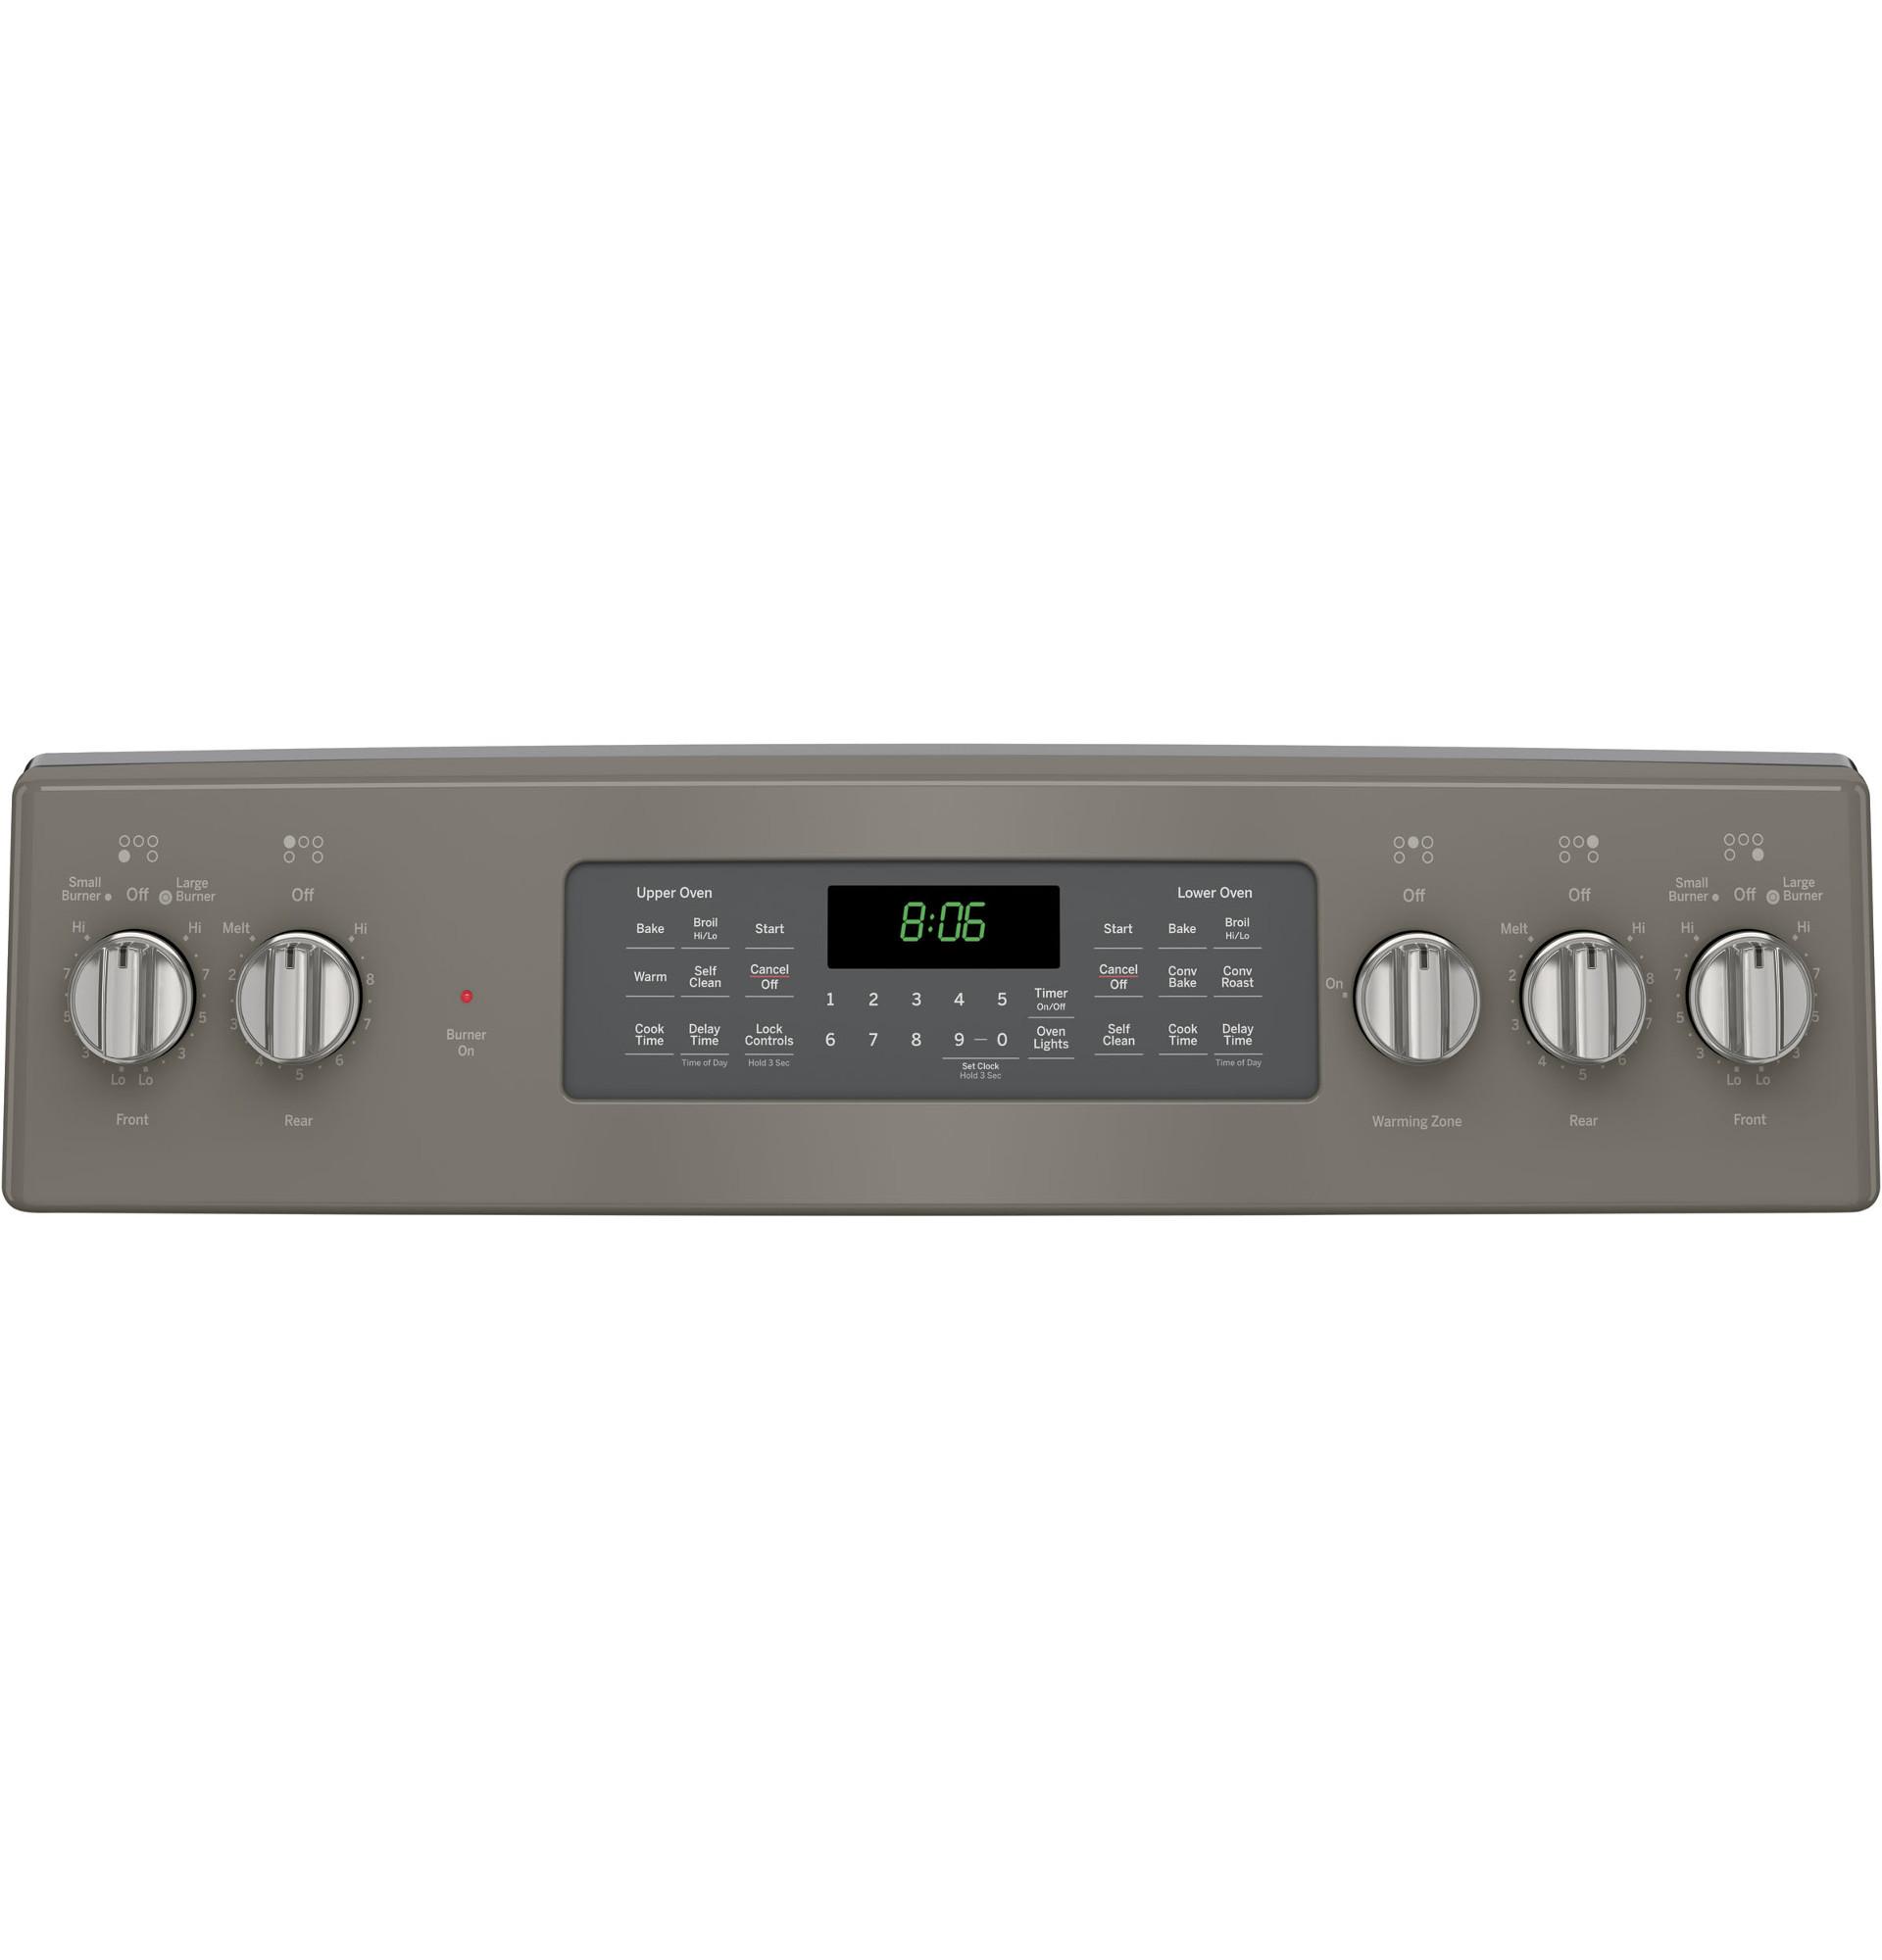 GE Appliances JB860EJES 6.6 cu. ft. Freestanding Electric Double Oven Convection Range - Slate